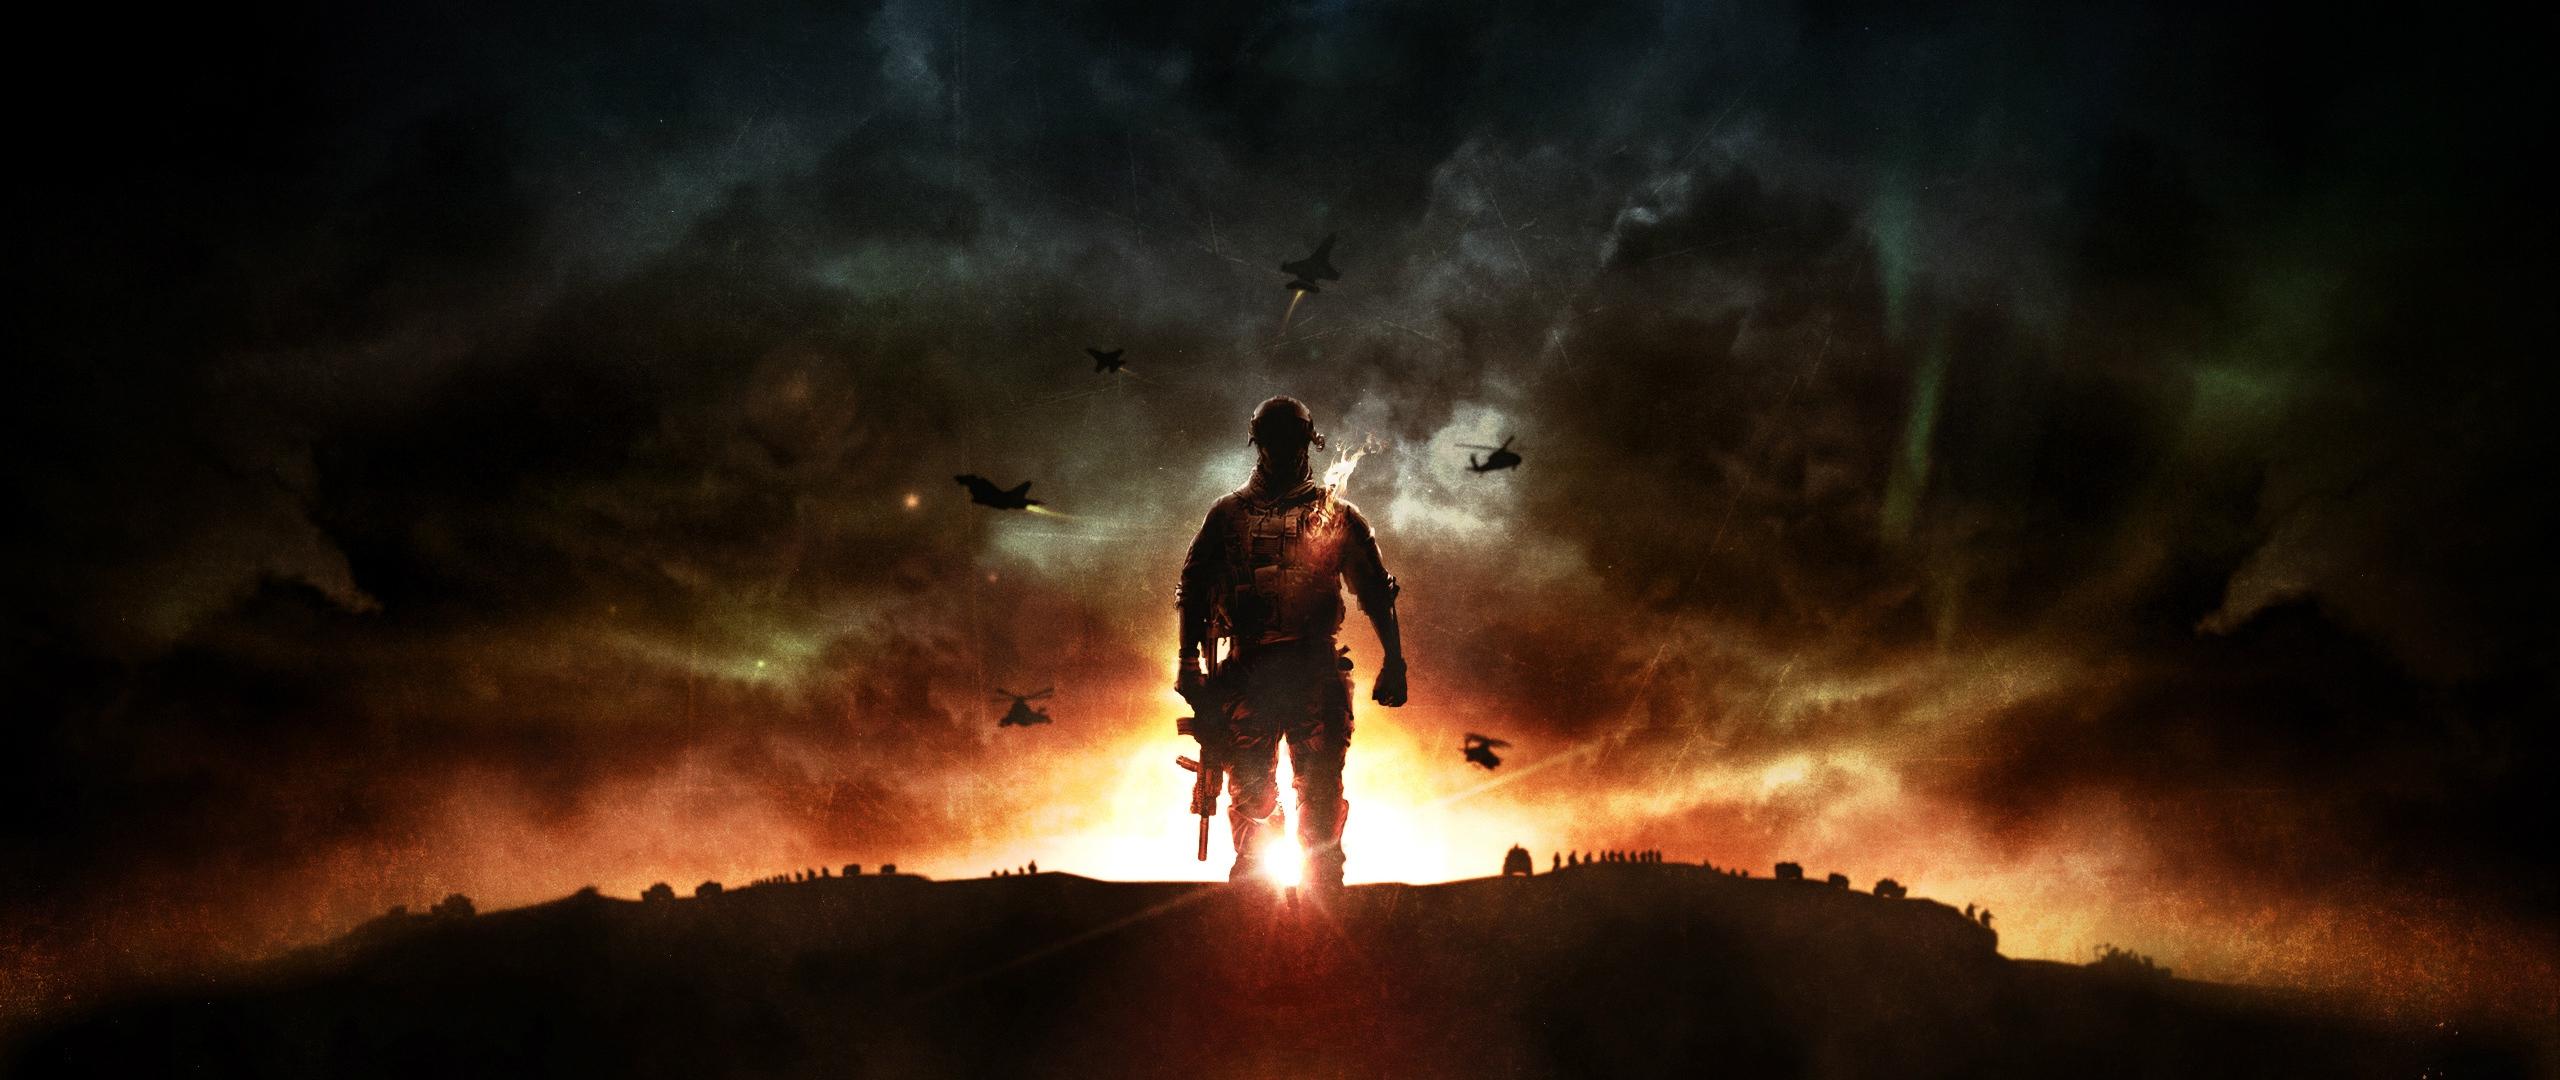 2560x1080 Wallpaper battlefield 4 game explosion ea digital 2560x1080